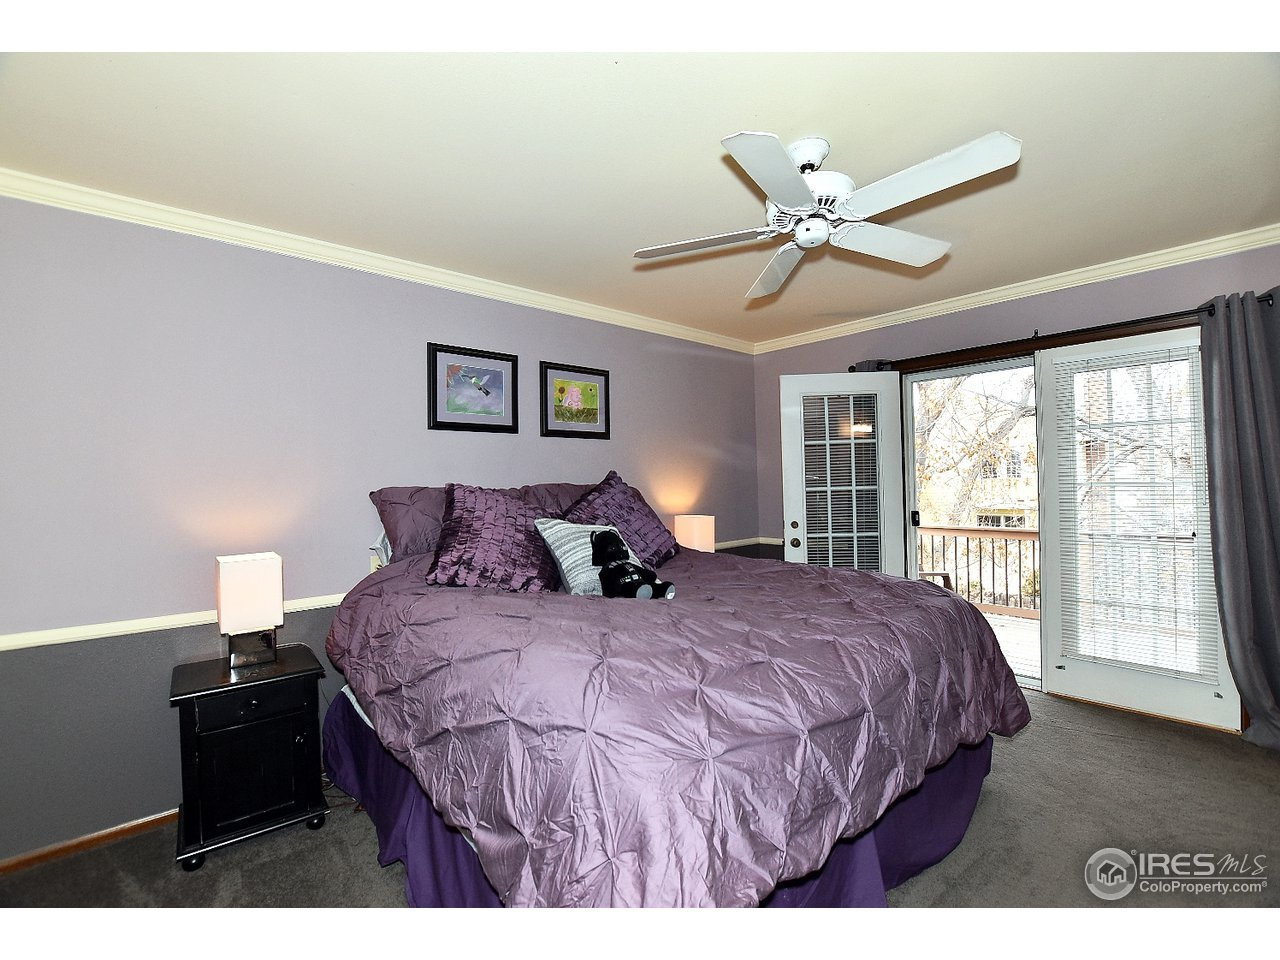 Master bedroom with French door to deck